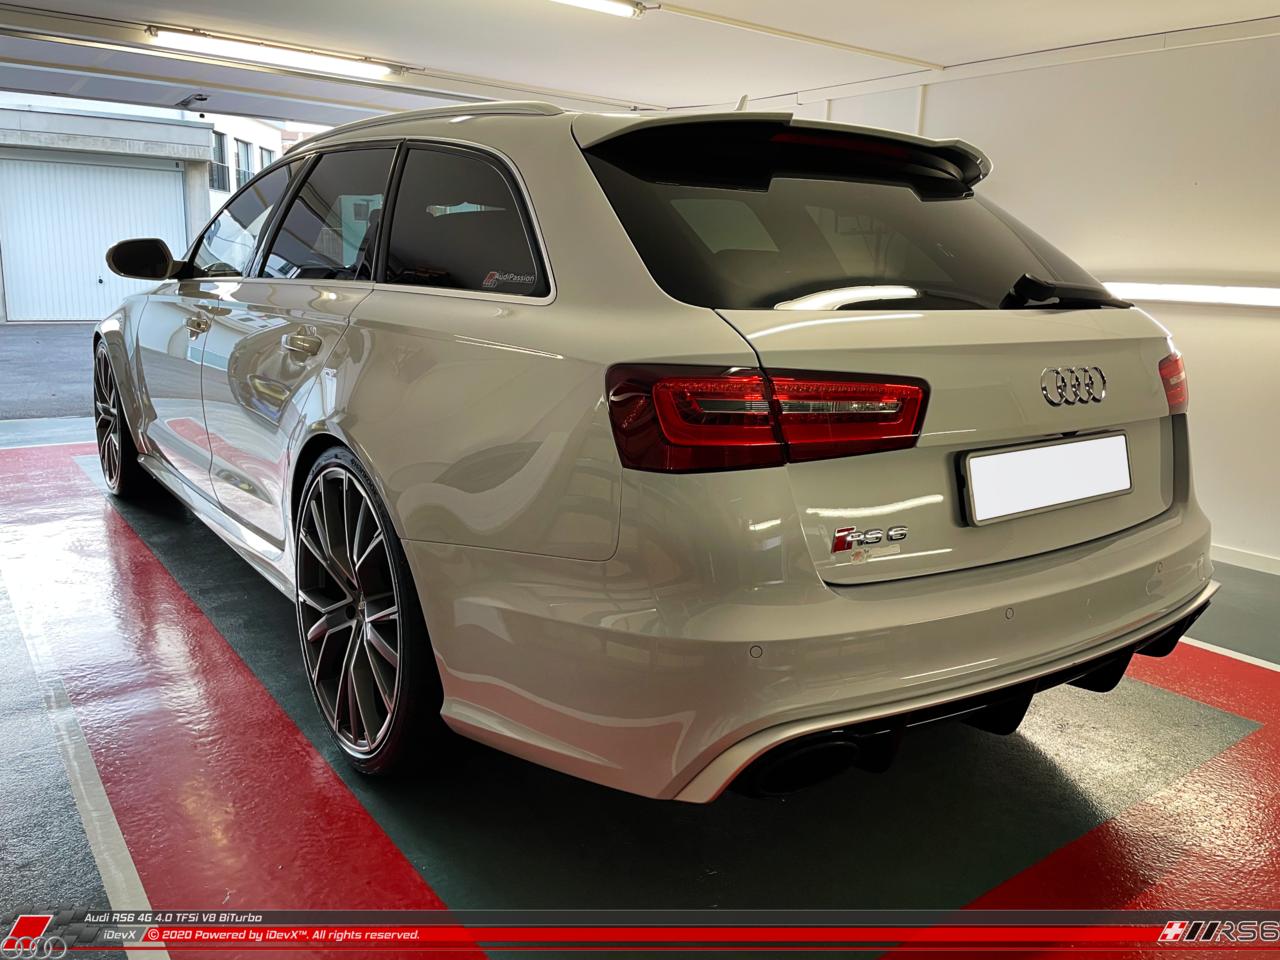 19.02.2021_Audi-RS6_iDevX_006.png